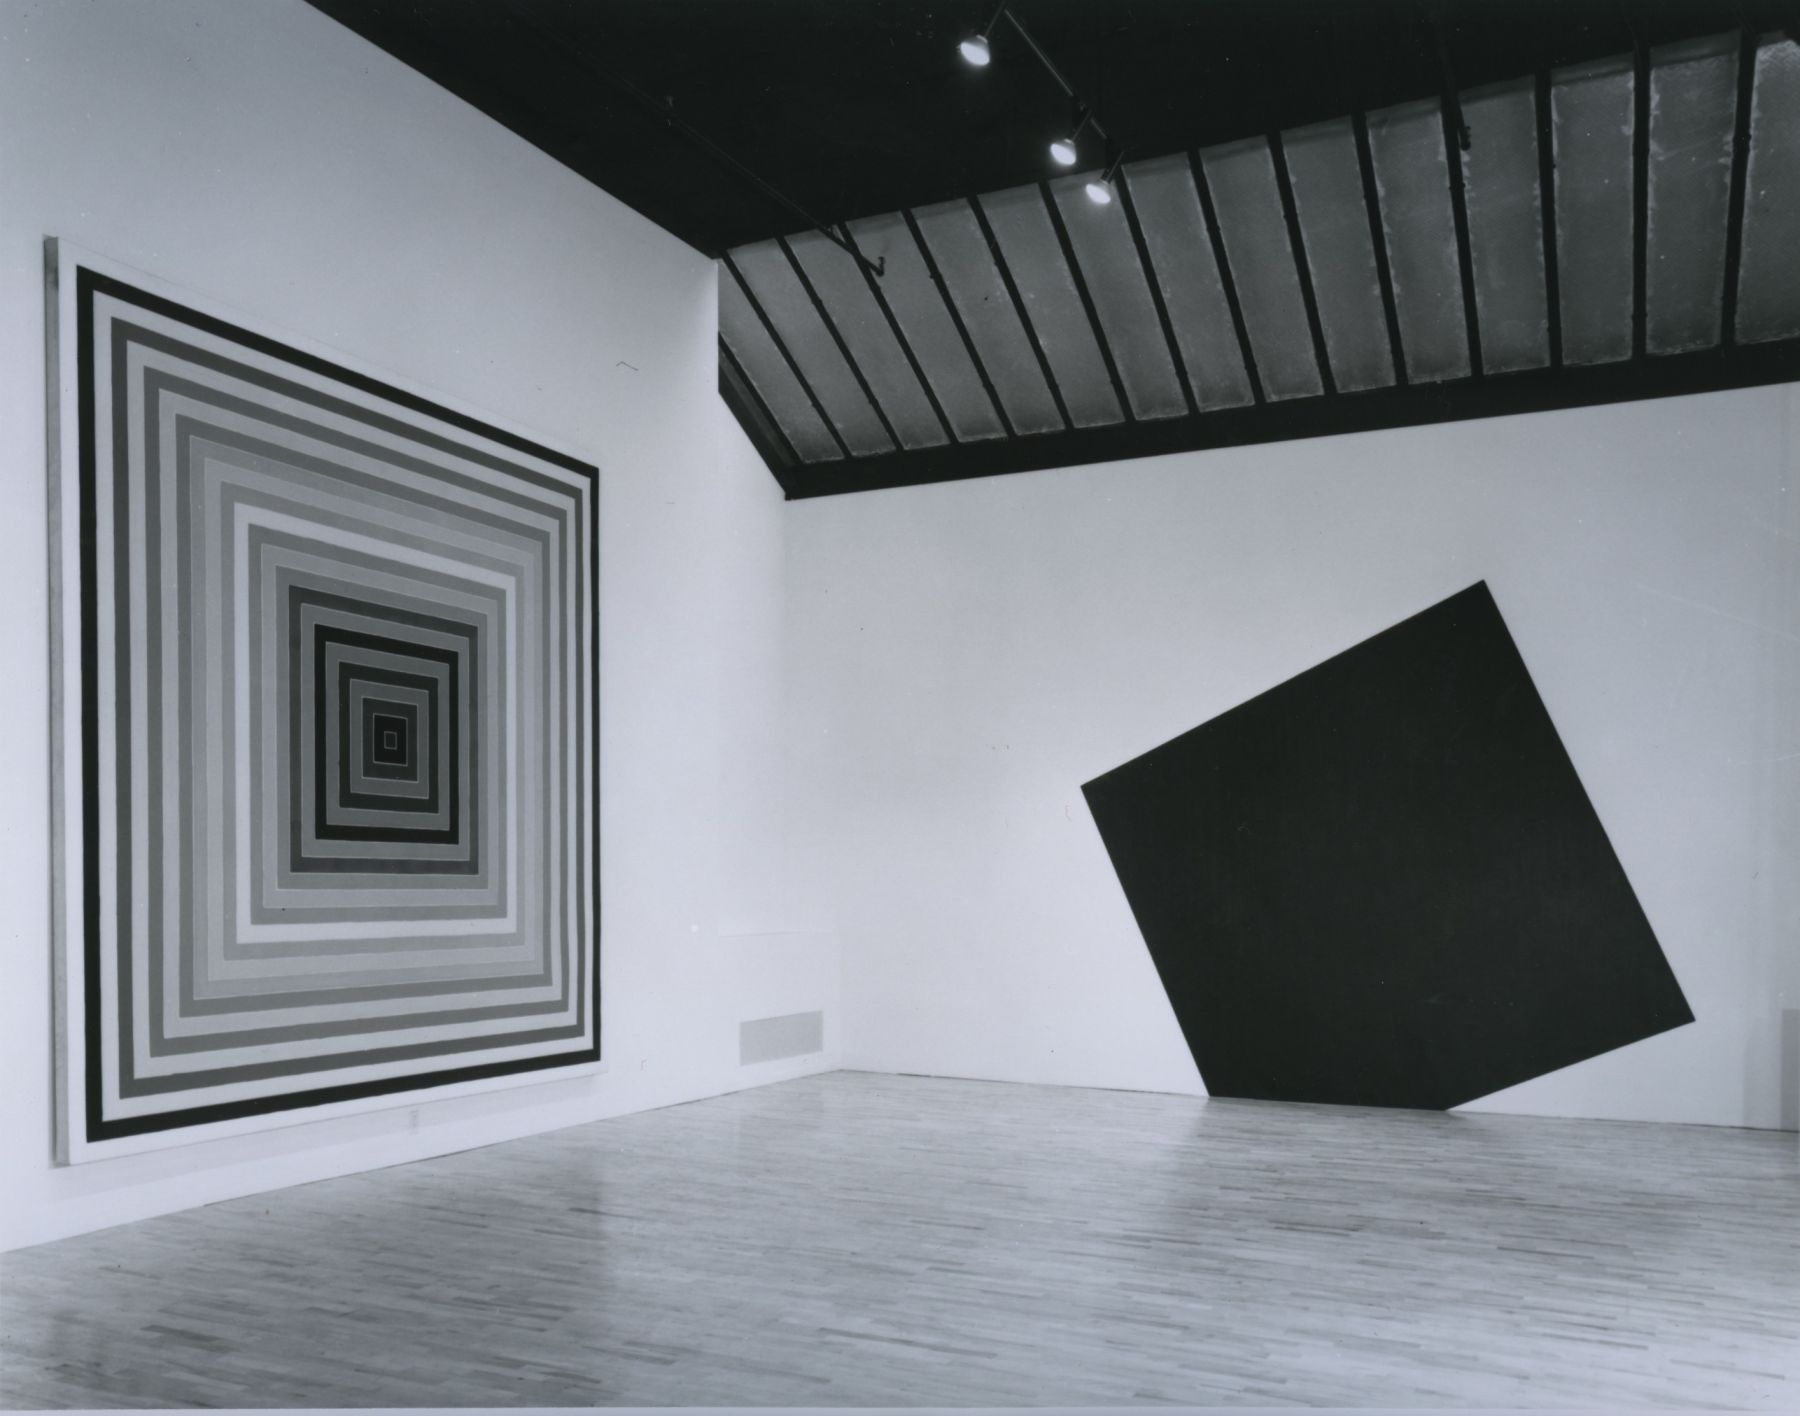 Installation view, Opening Exhibition, 142 GREENE